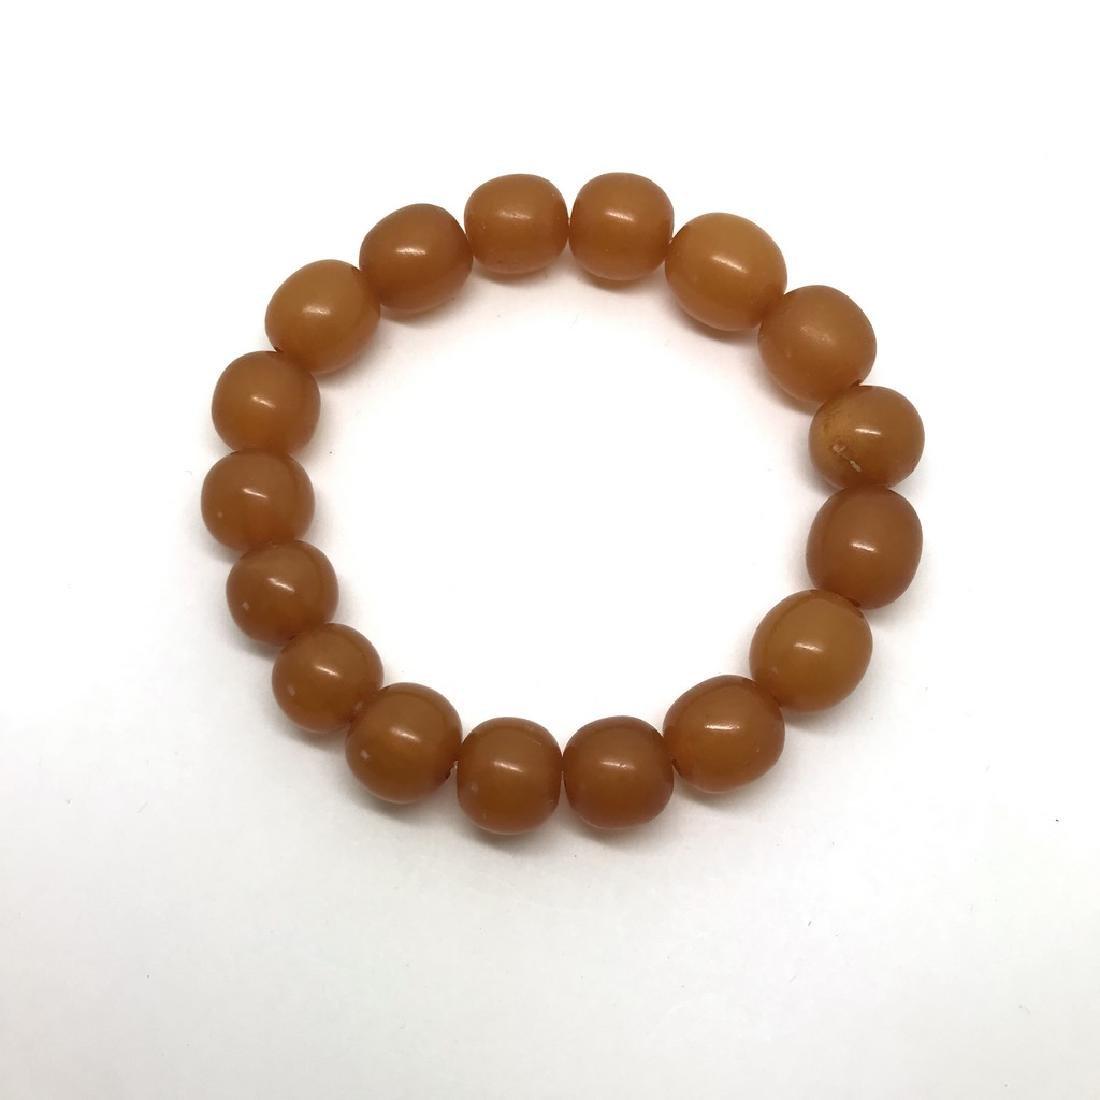 Vintage bracelet Baltic amber butterscotch beads - 7